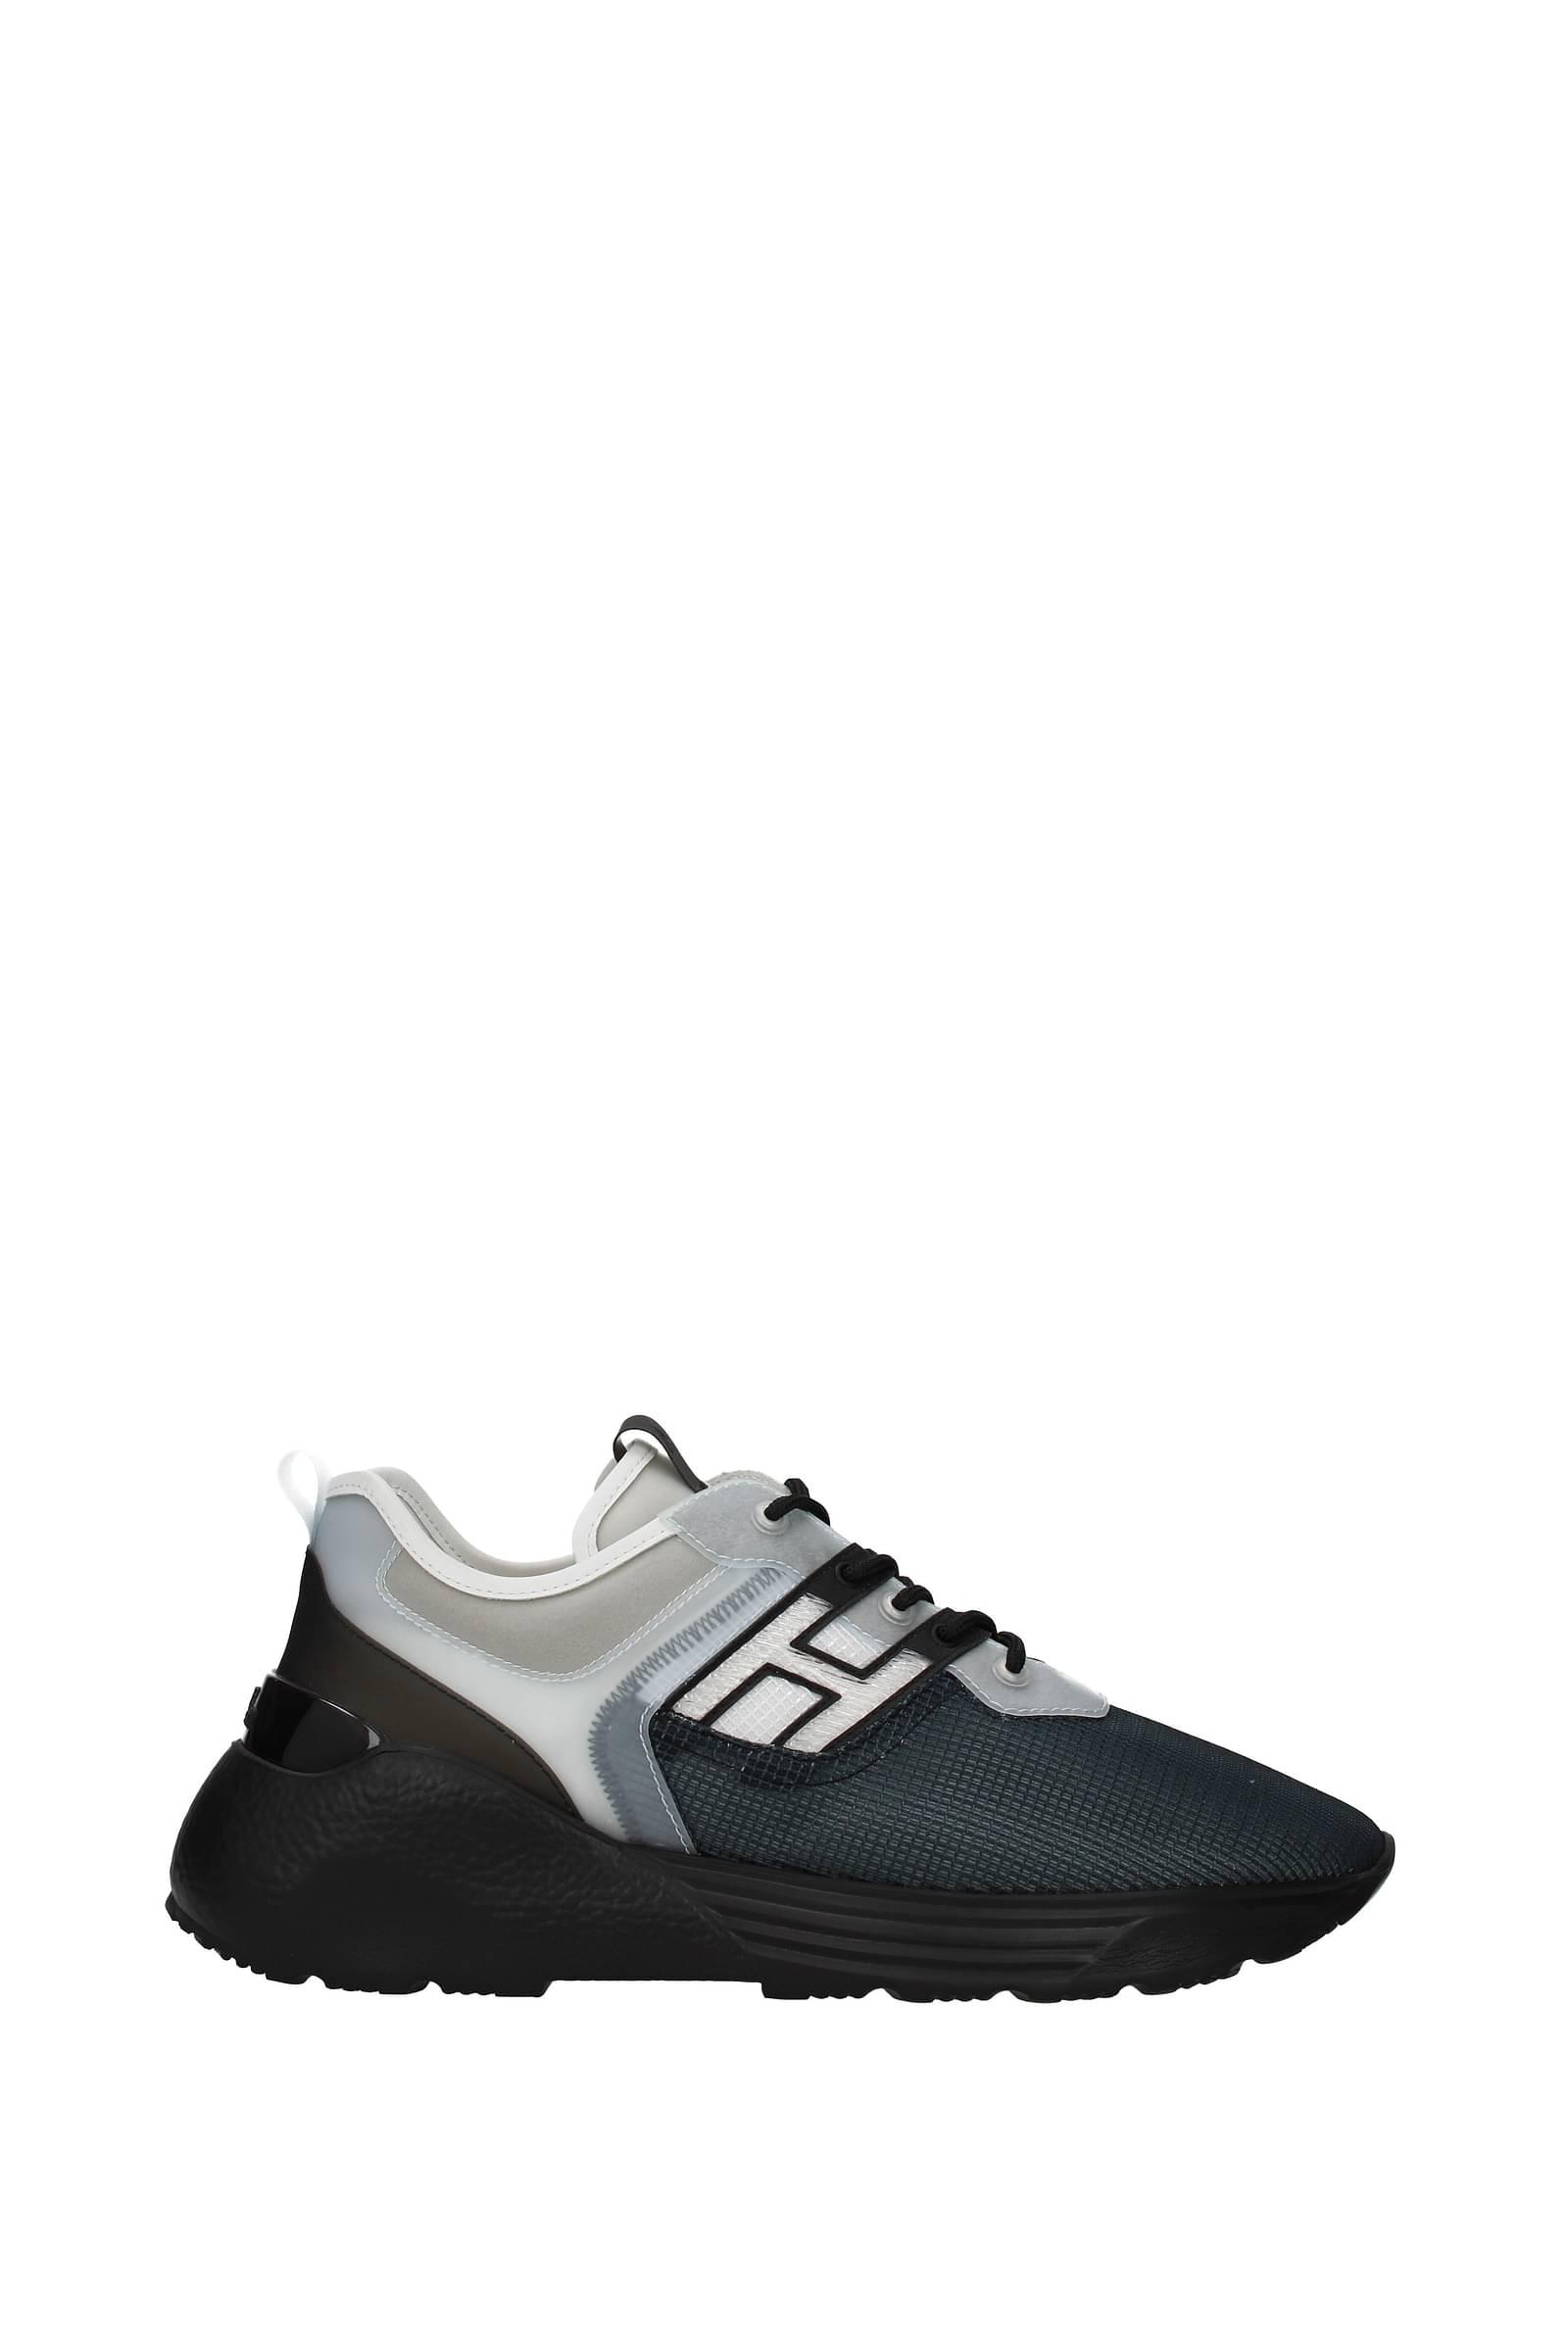 Zapatillas Hogan Hombre-Tela de espuma de memoria de H443 ...